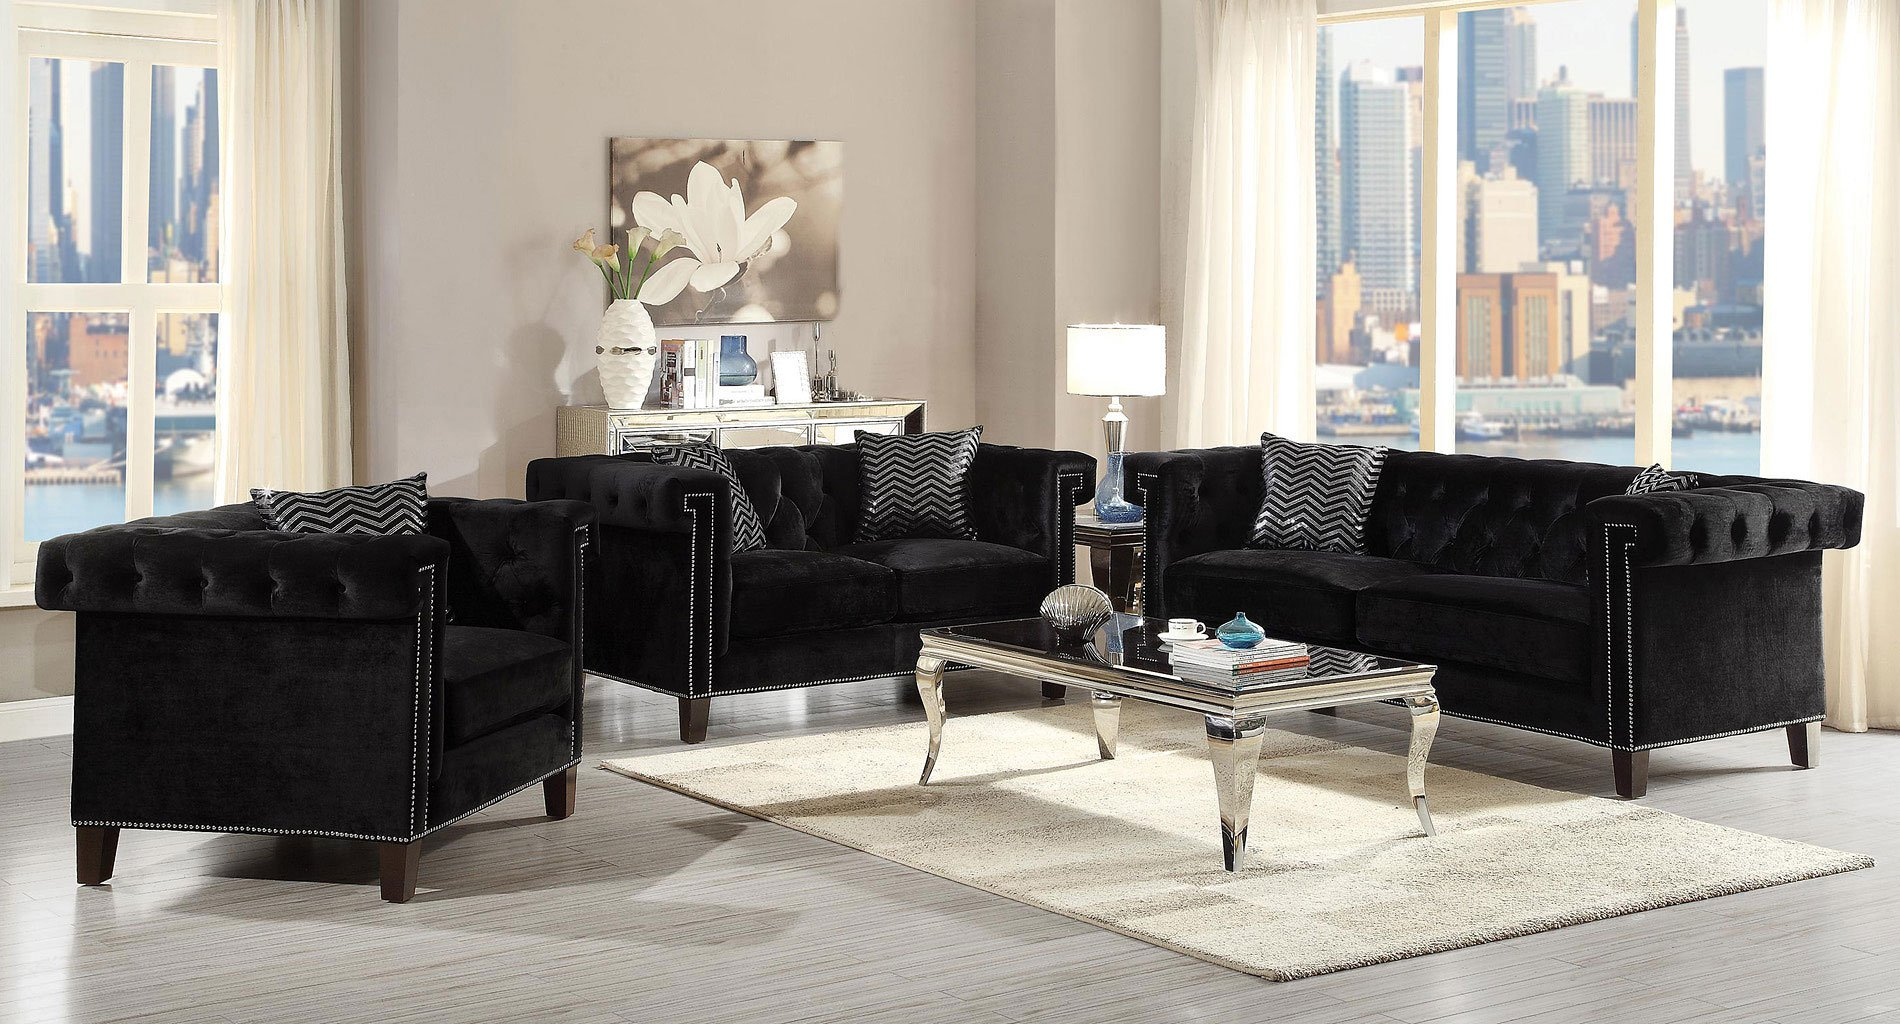 Reventlow living room set by coaster furniture 1 reviews furniturepick